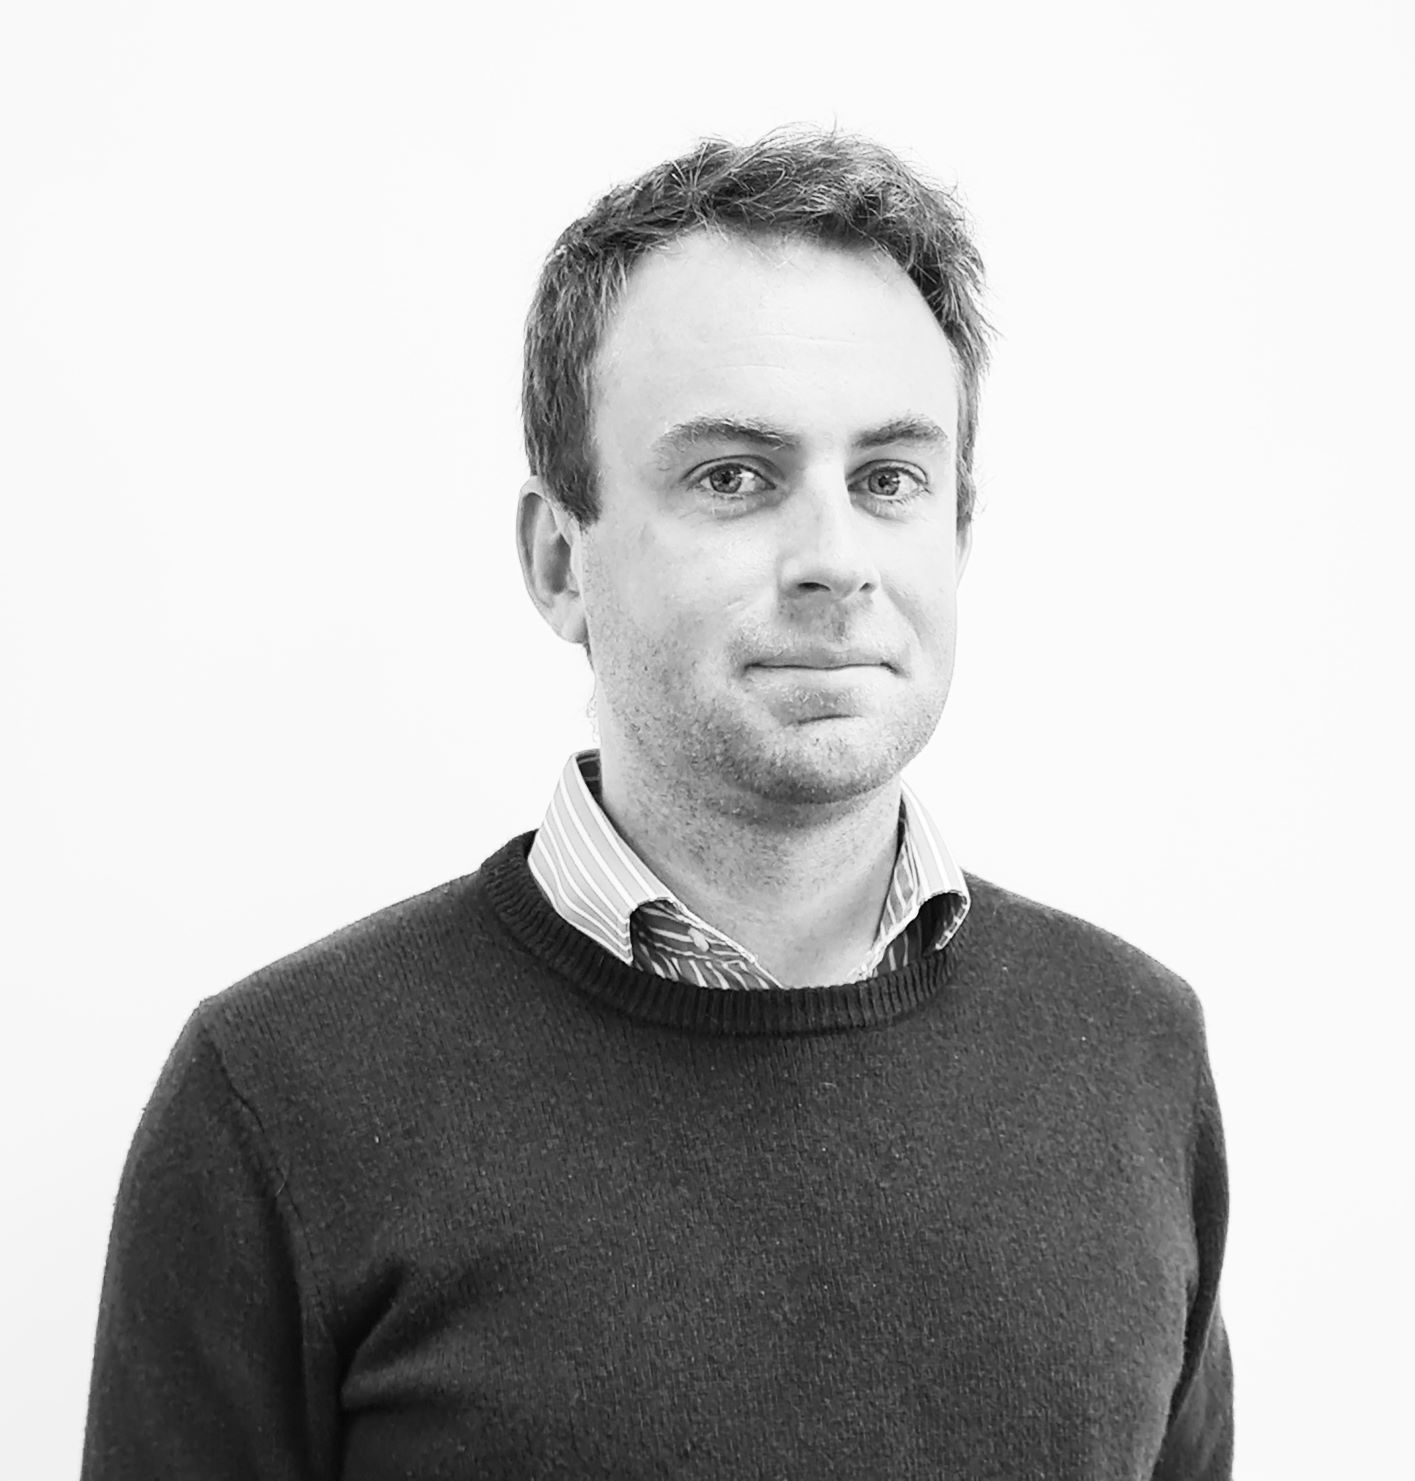 Image of Paul MacDonald